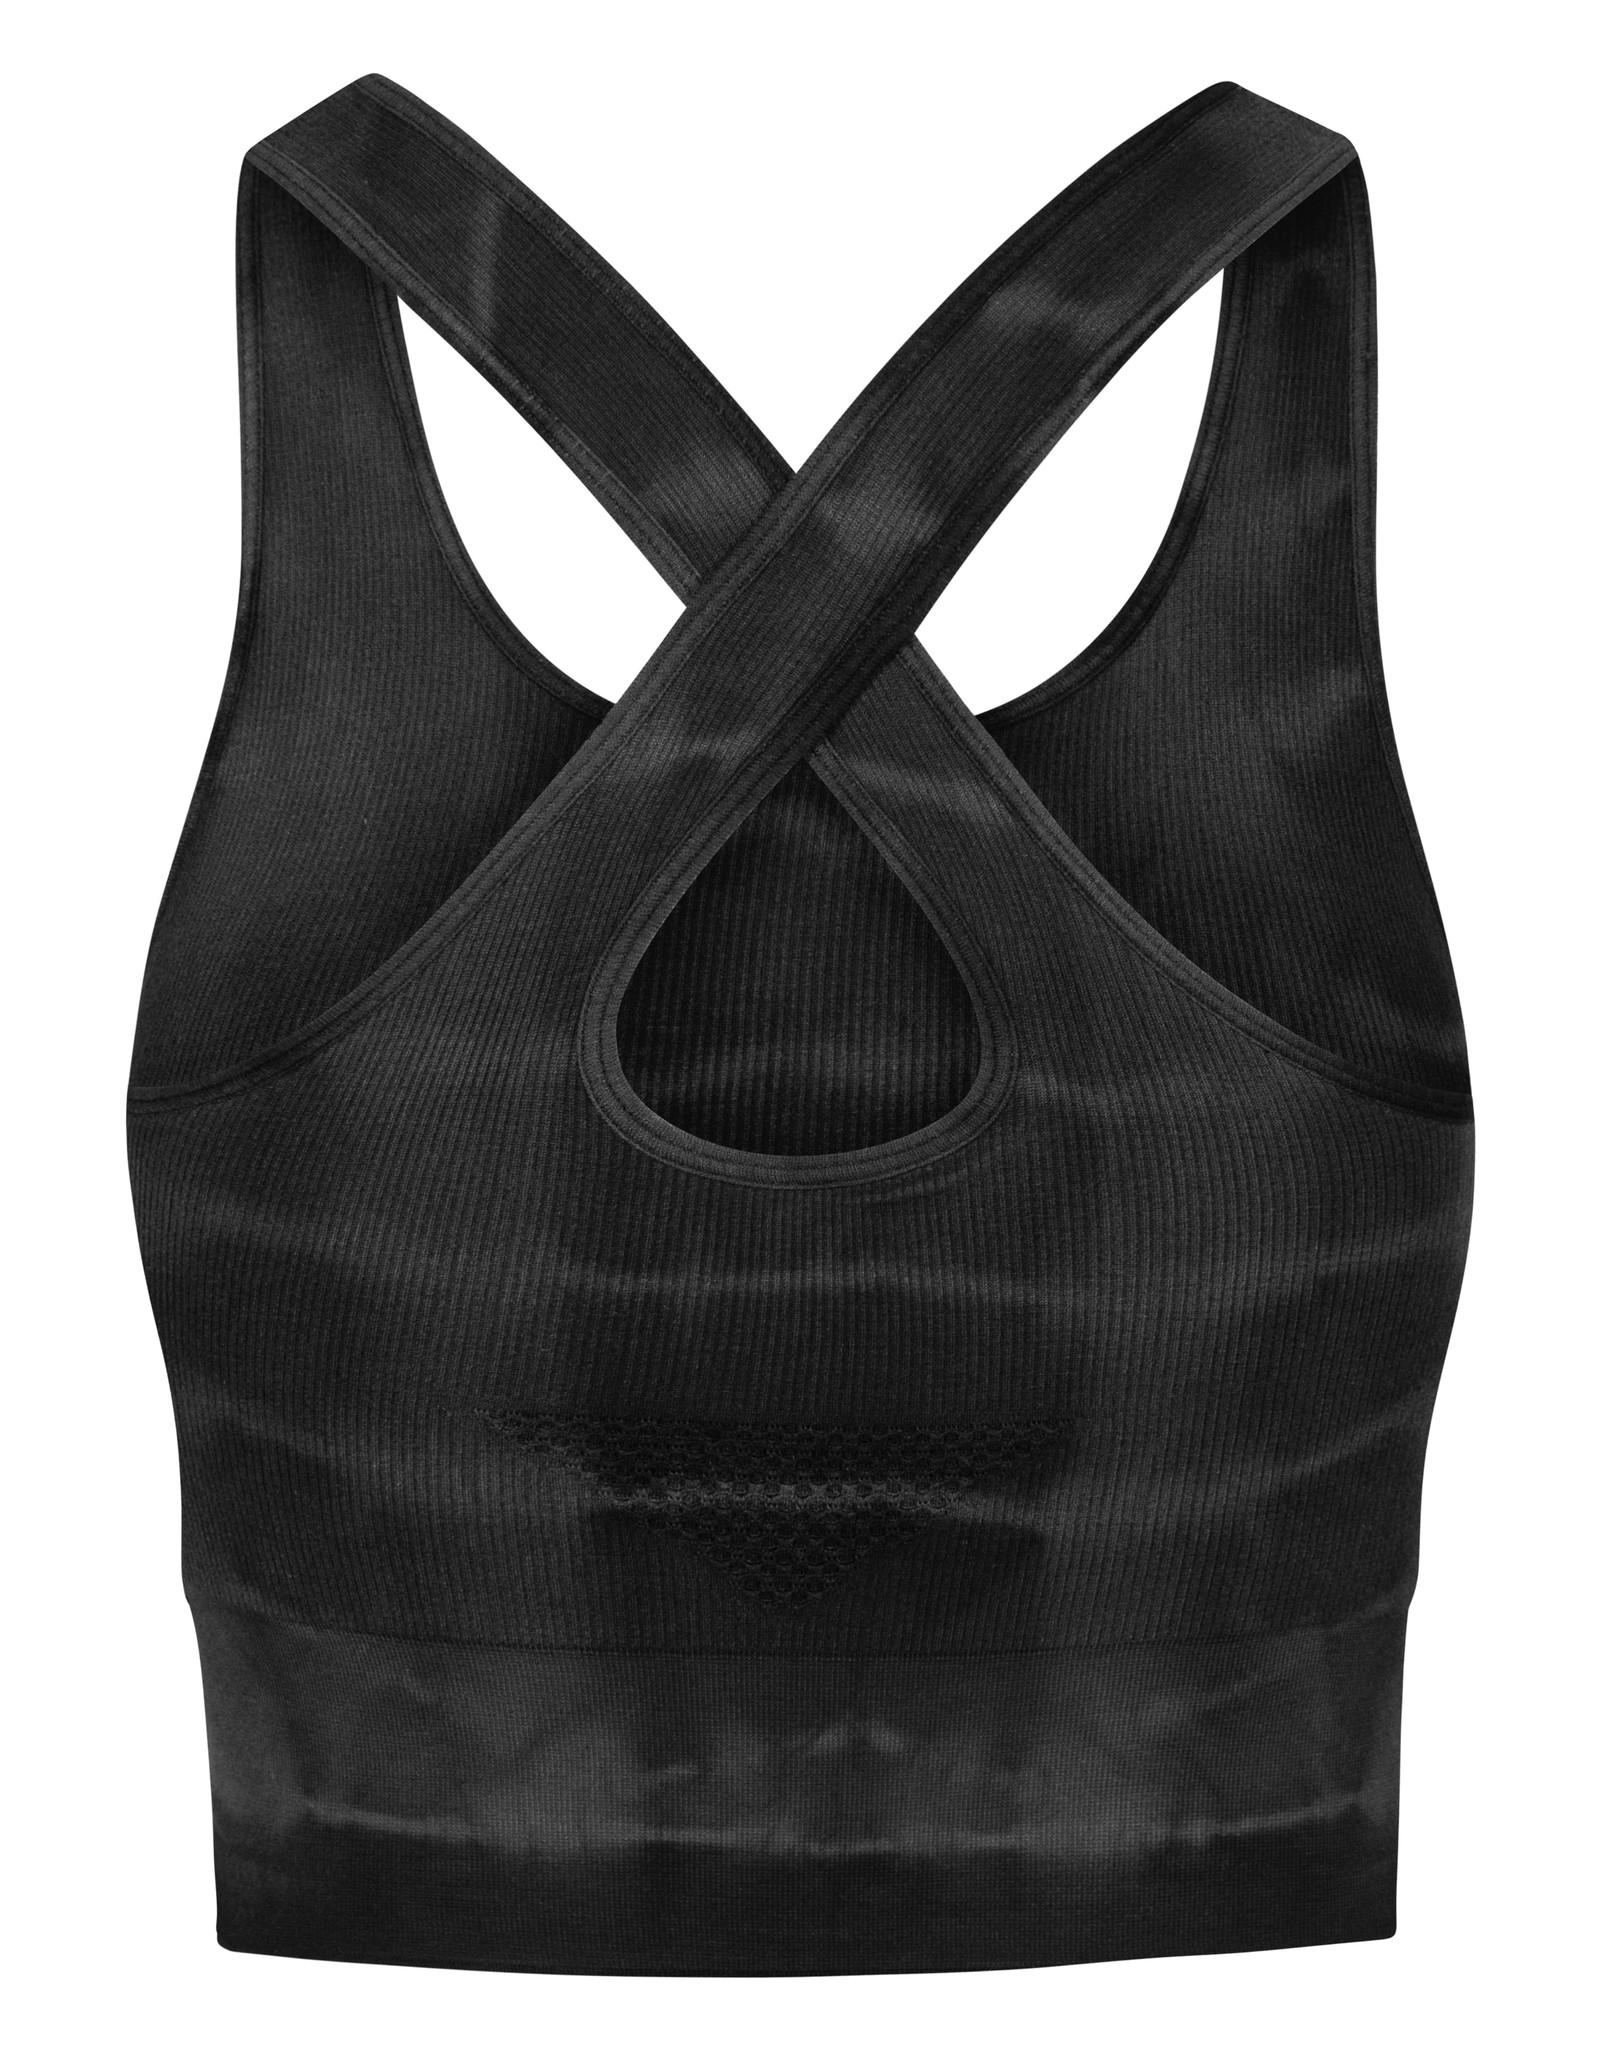 Gai & Lisva Lifa Petrol Grey Tie Dye Supersoft Rib Modal Top